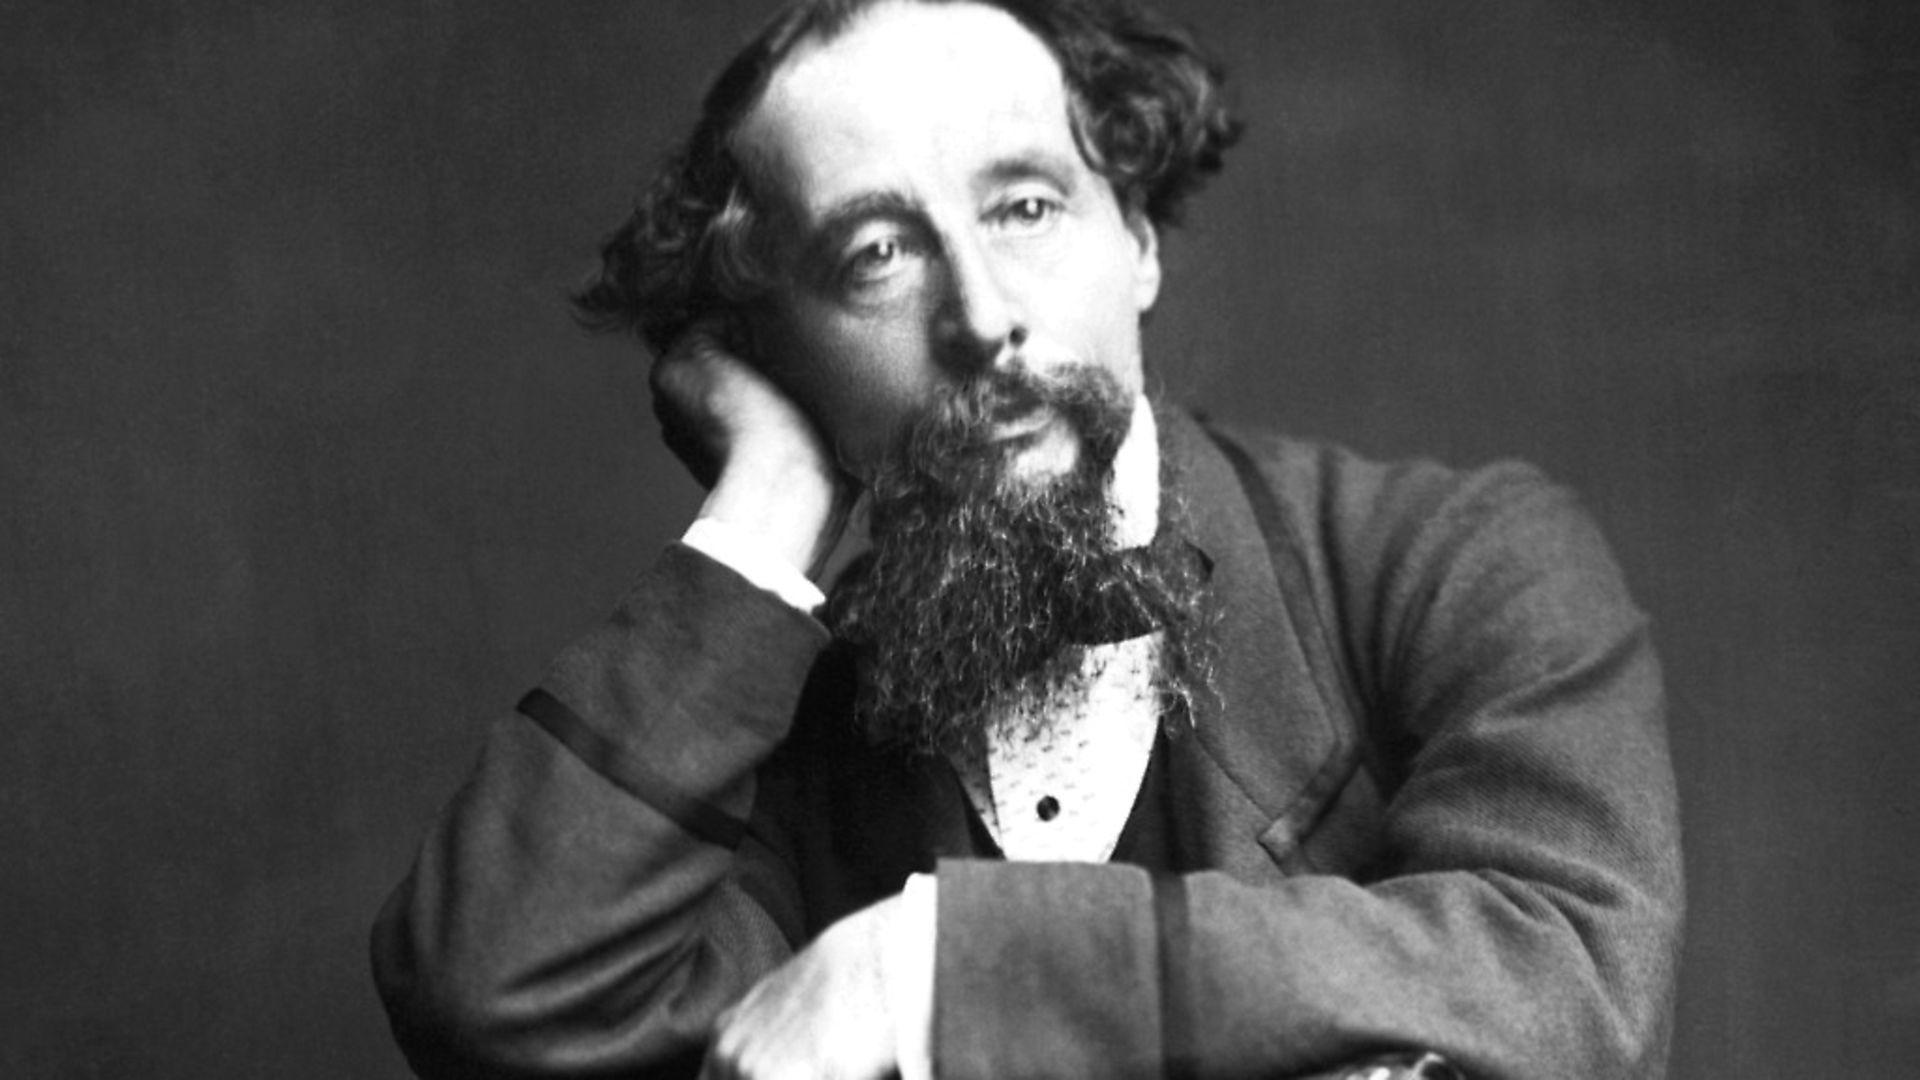 (Original Caption) Photograph of Charles Dickens (1812-1870) seated. Photo: Bettmann Archive - Credit: Bettmann Archive